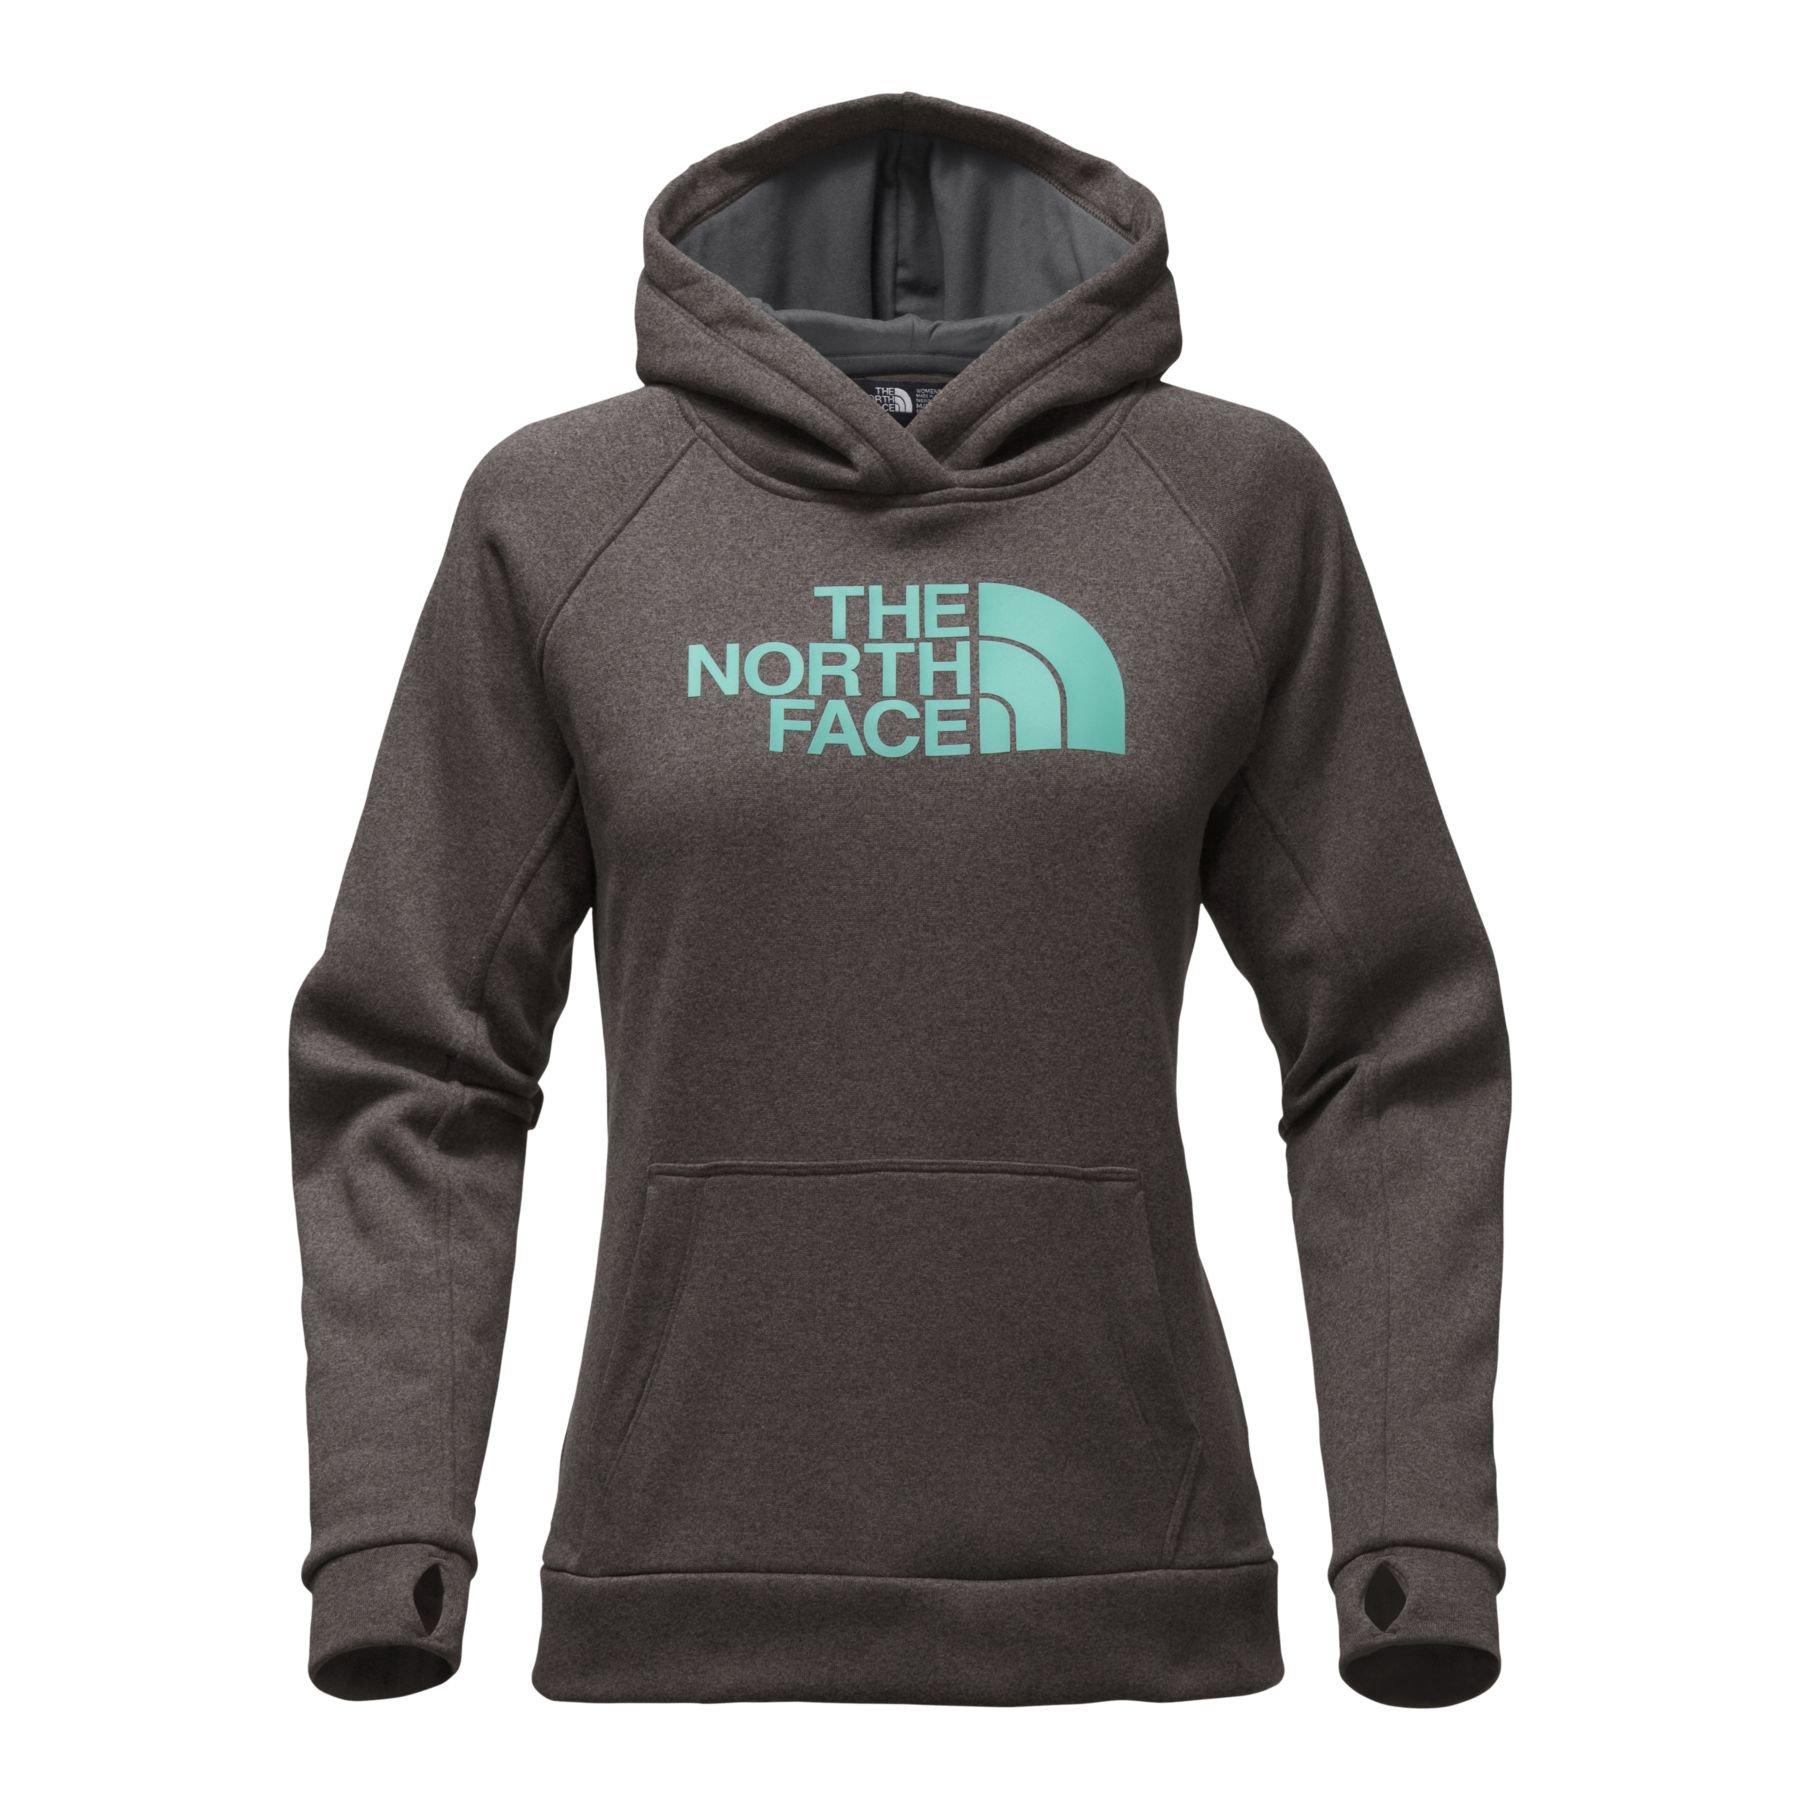 The North Face Women's Fave Half Dome Pullover Hoodie - TNF Dark Grey Heather/Bristol Blue - M